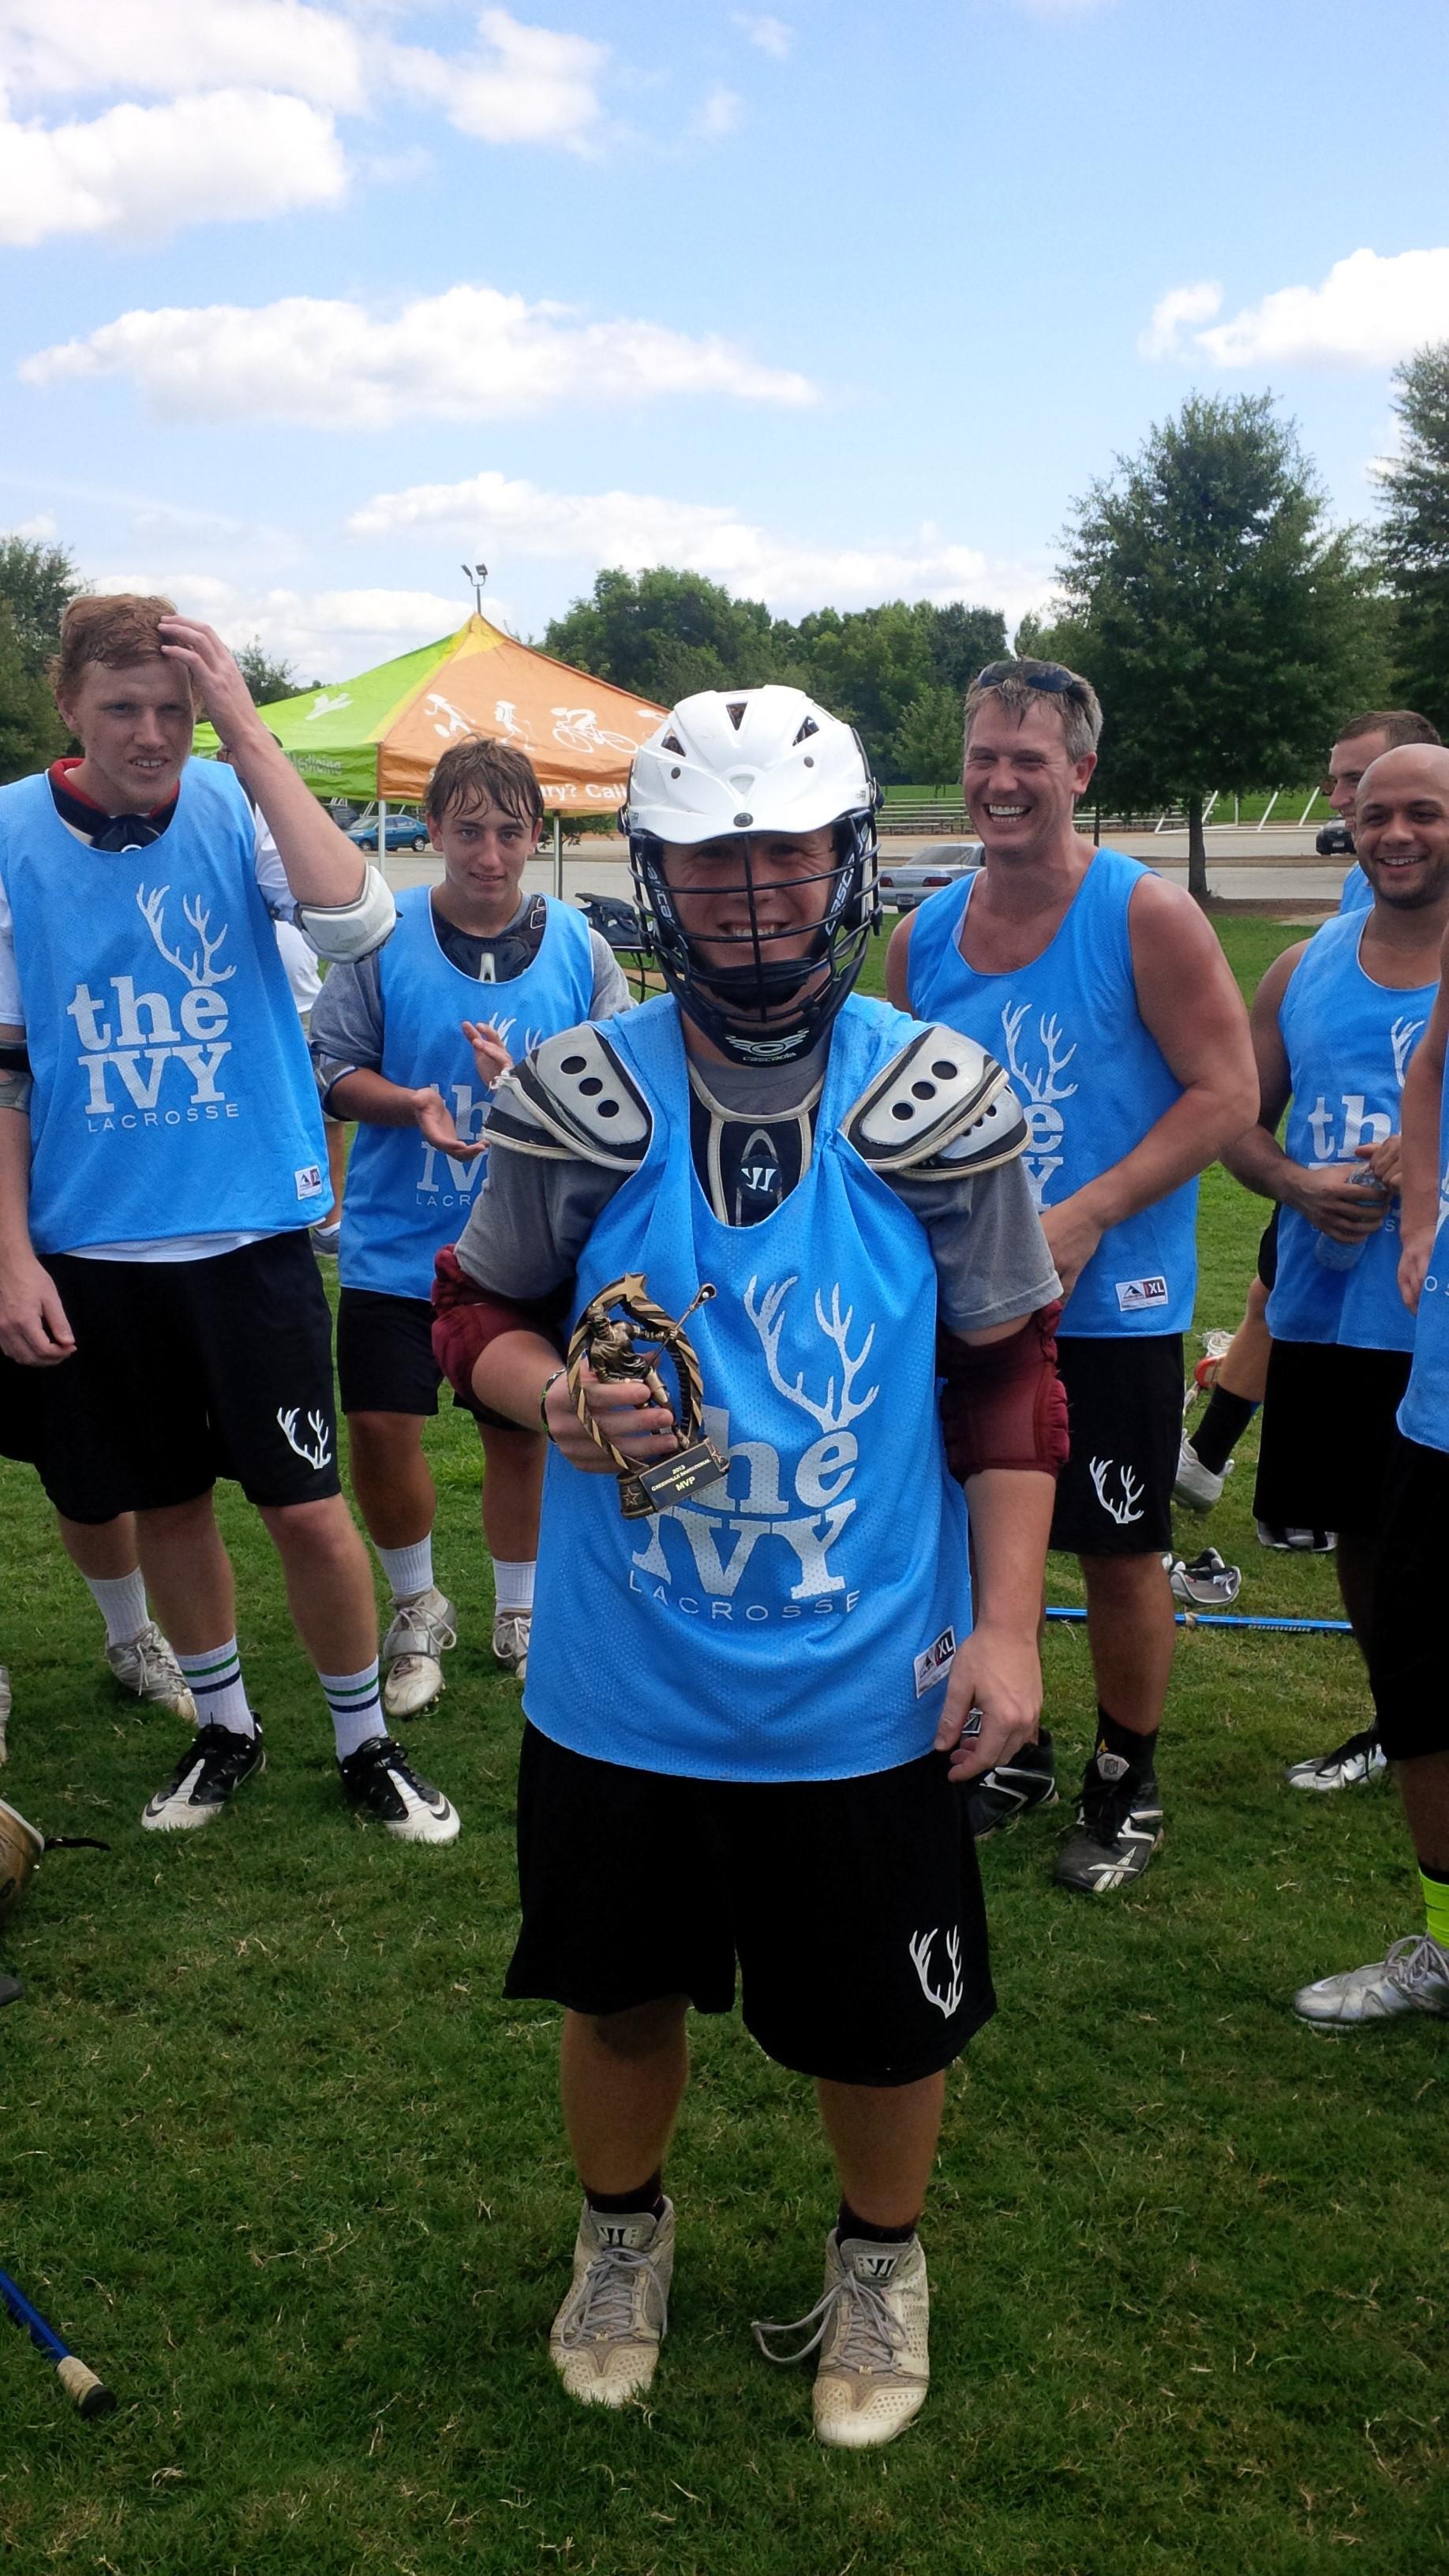 The Ivy Lacrosse Club - MVP